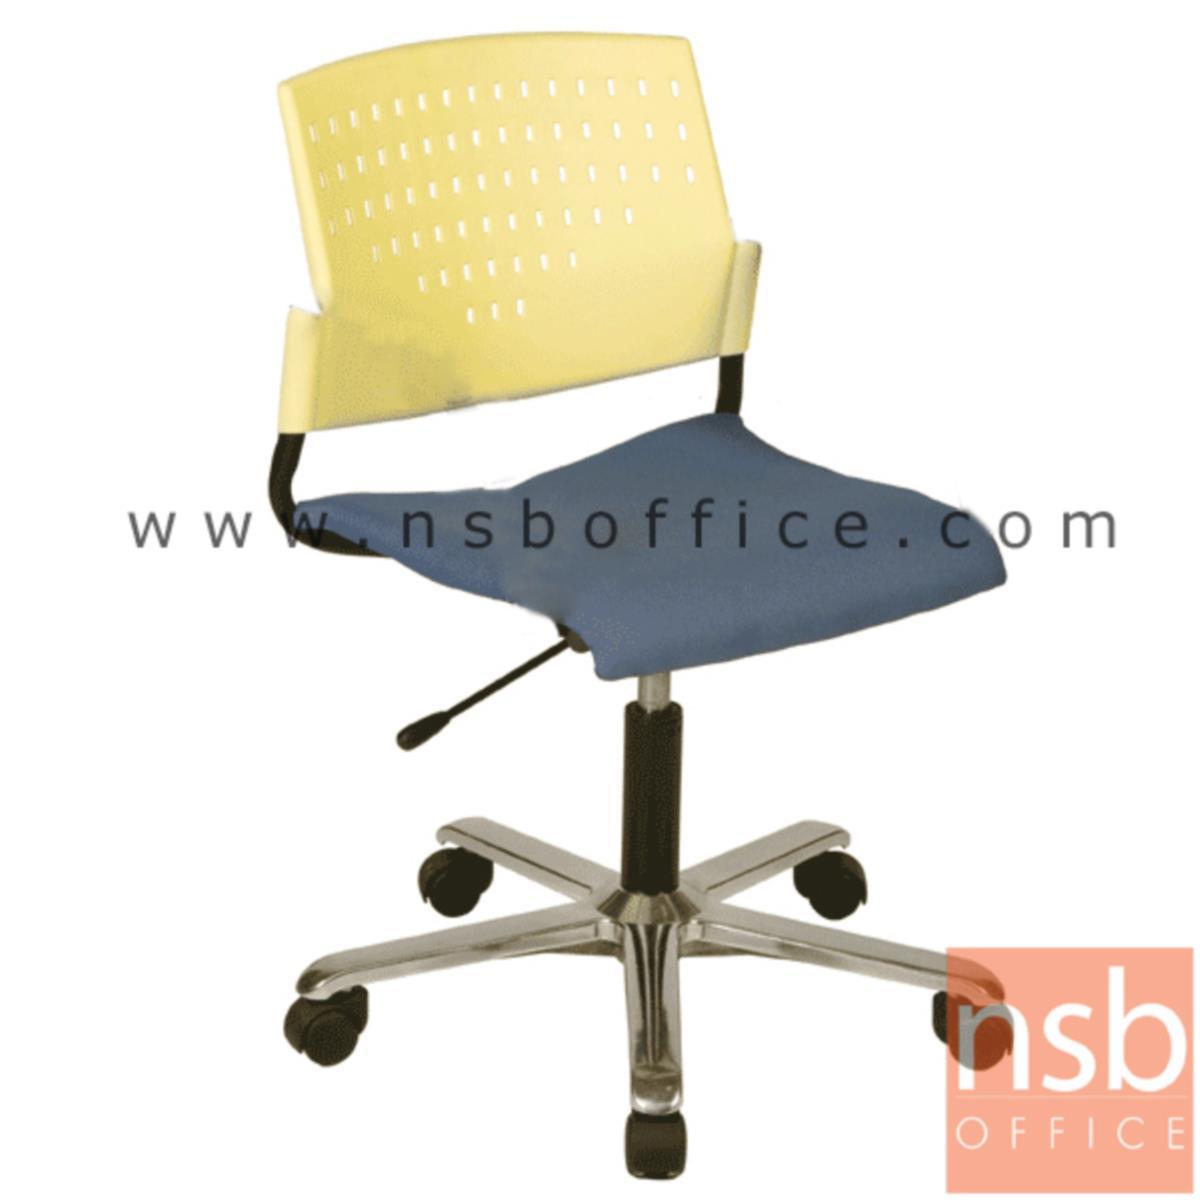 B24A219:เก้าอี้สำนักงานโพลี่ รุ่น Terence (เทเรนซ์)  โช๊คแก๊ส ขาเหล็กชุบโครเมี่ยม